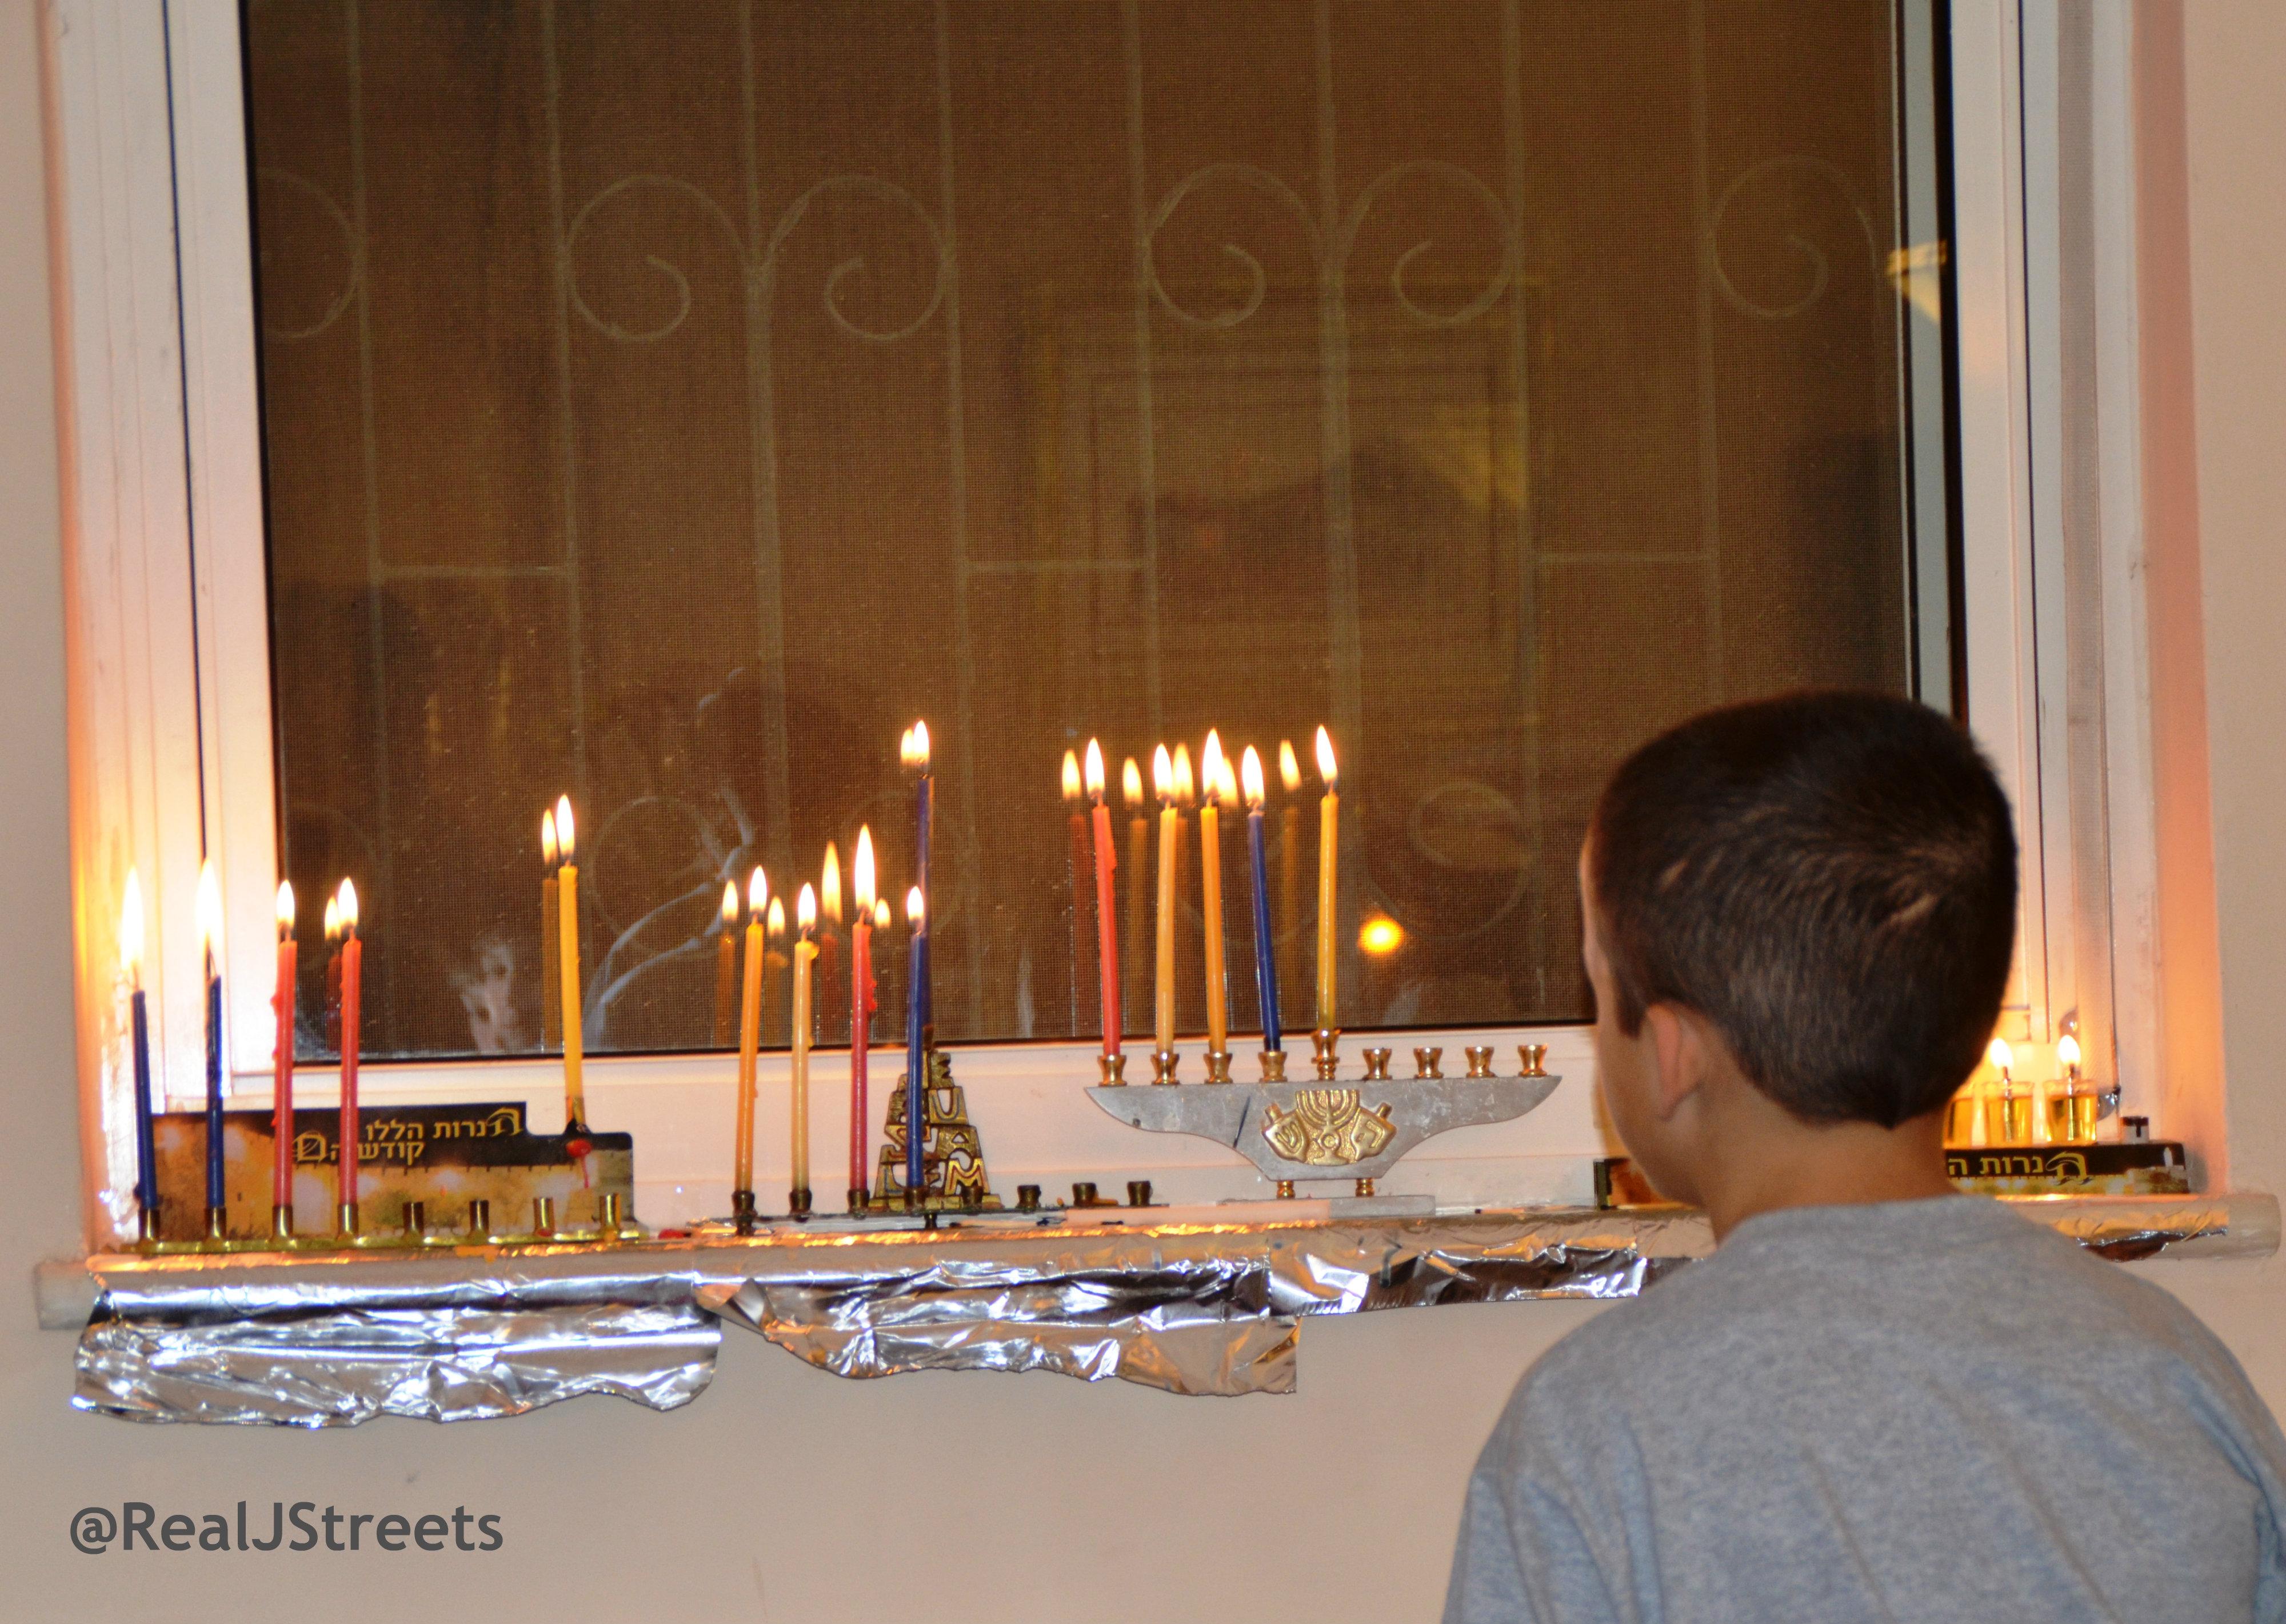 image chanukah, picture hanukah candls, image hanuka